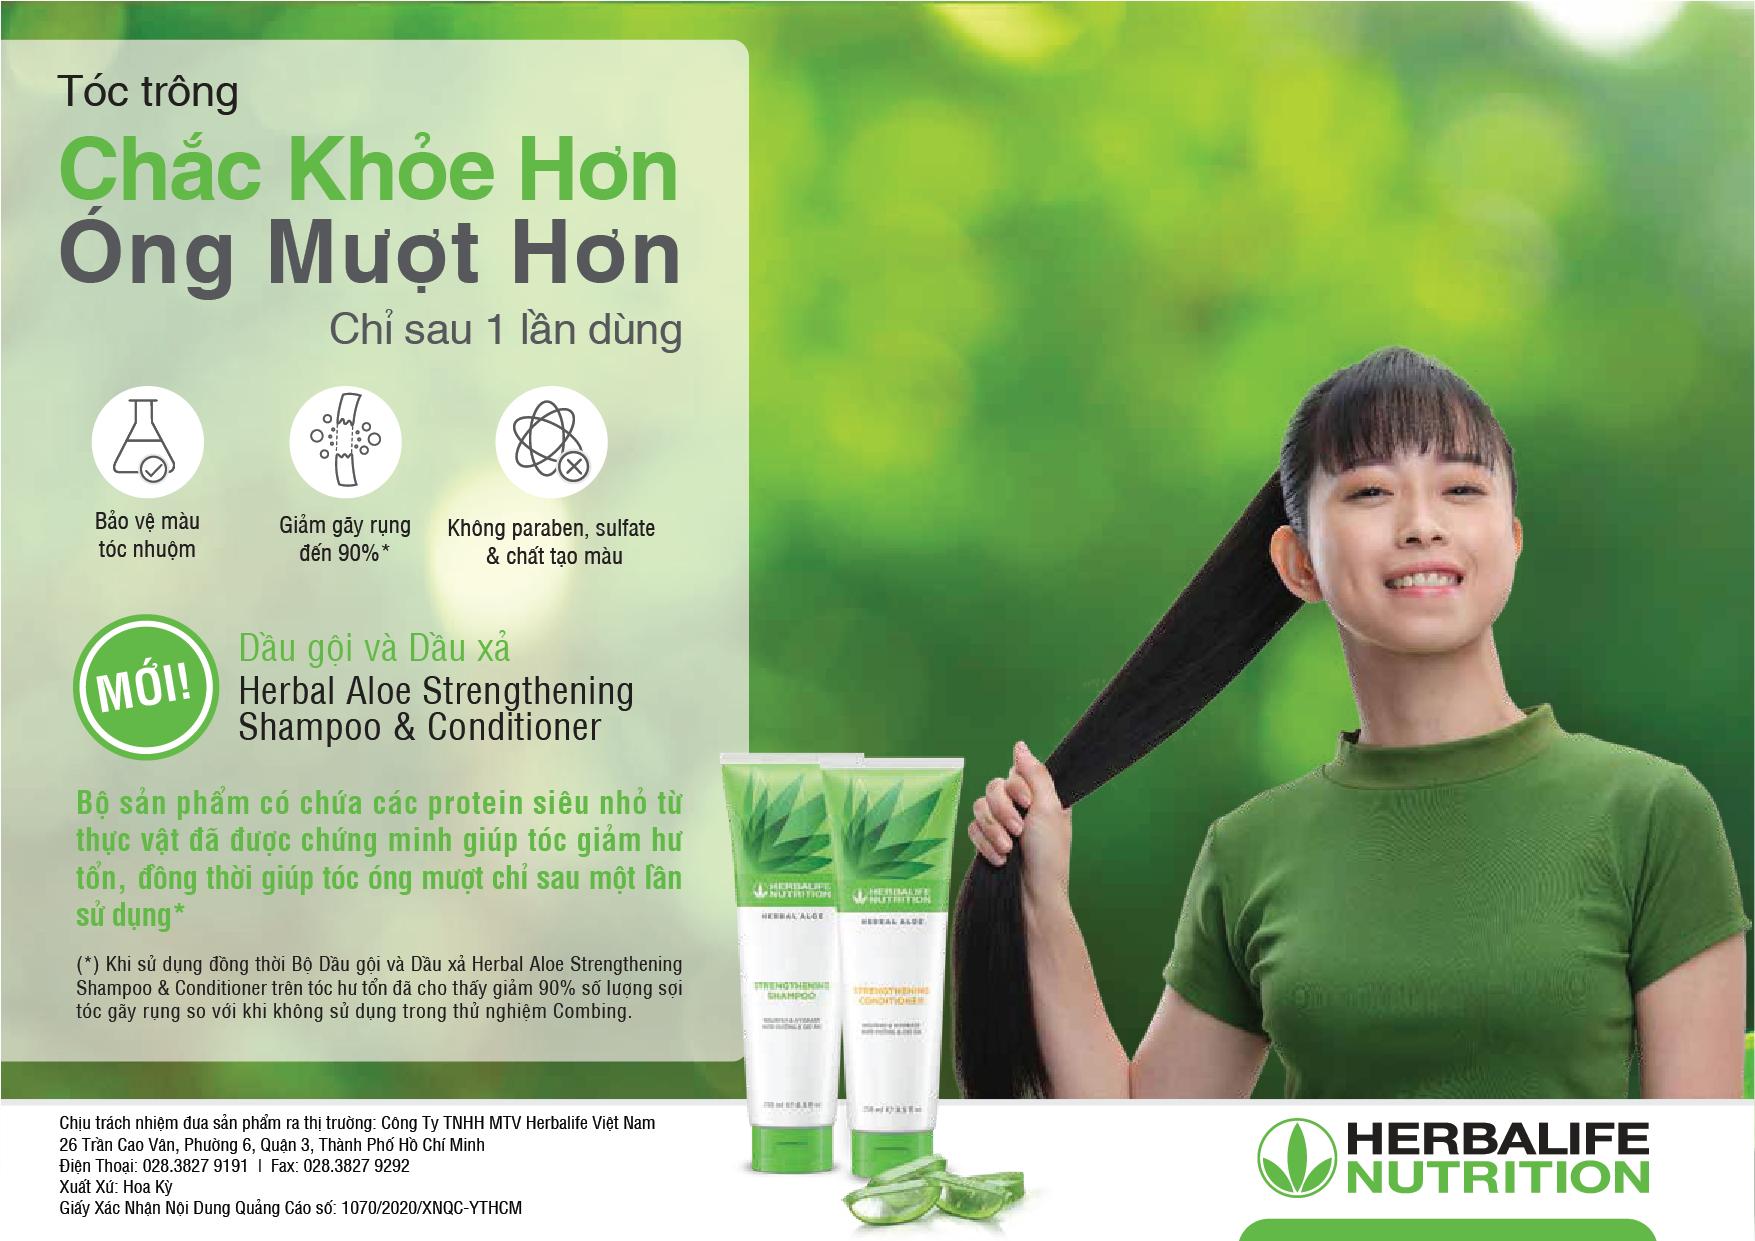 herbalife vietnam launches herbal aloe shampoo and herbal aloe conditioner